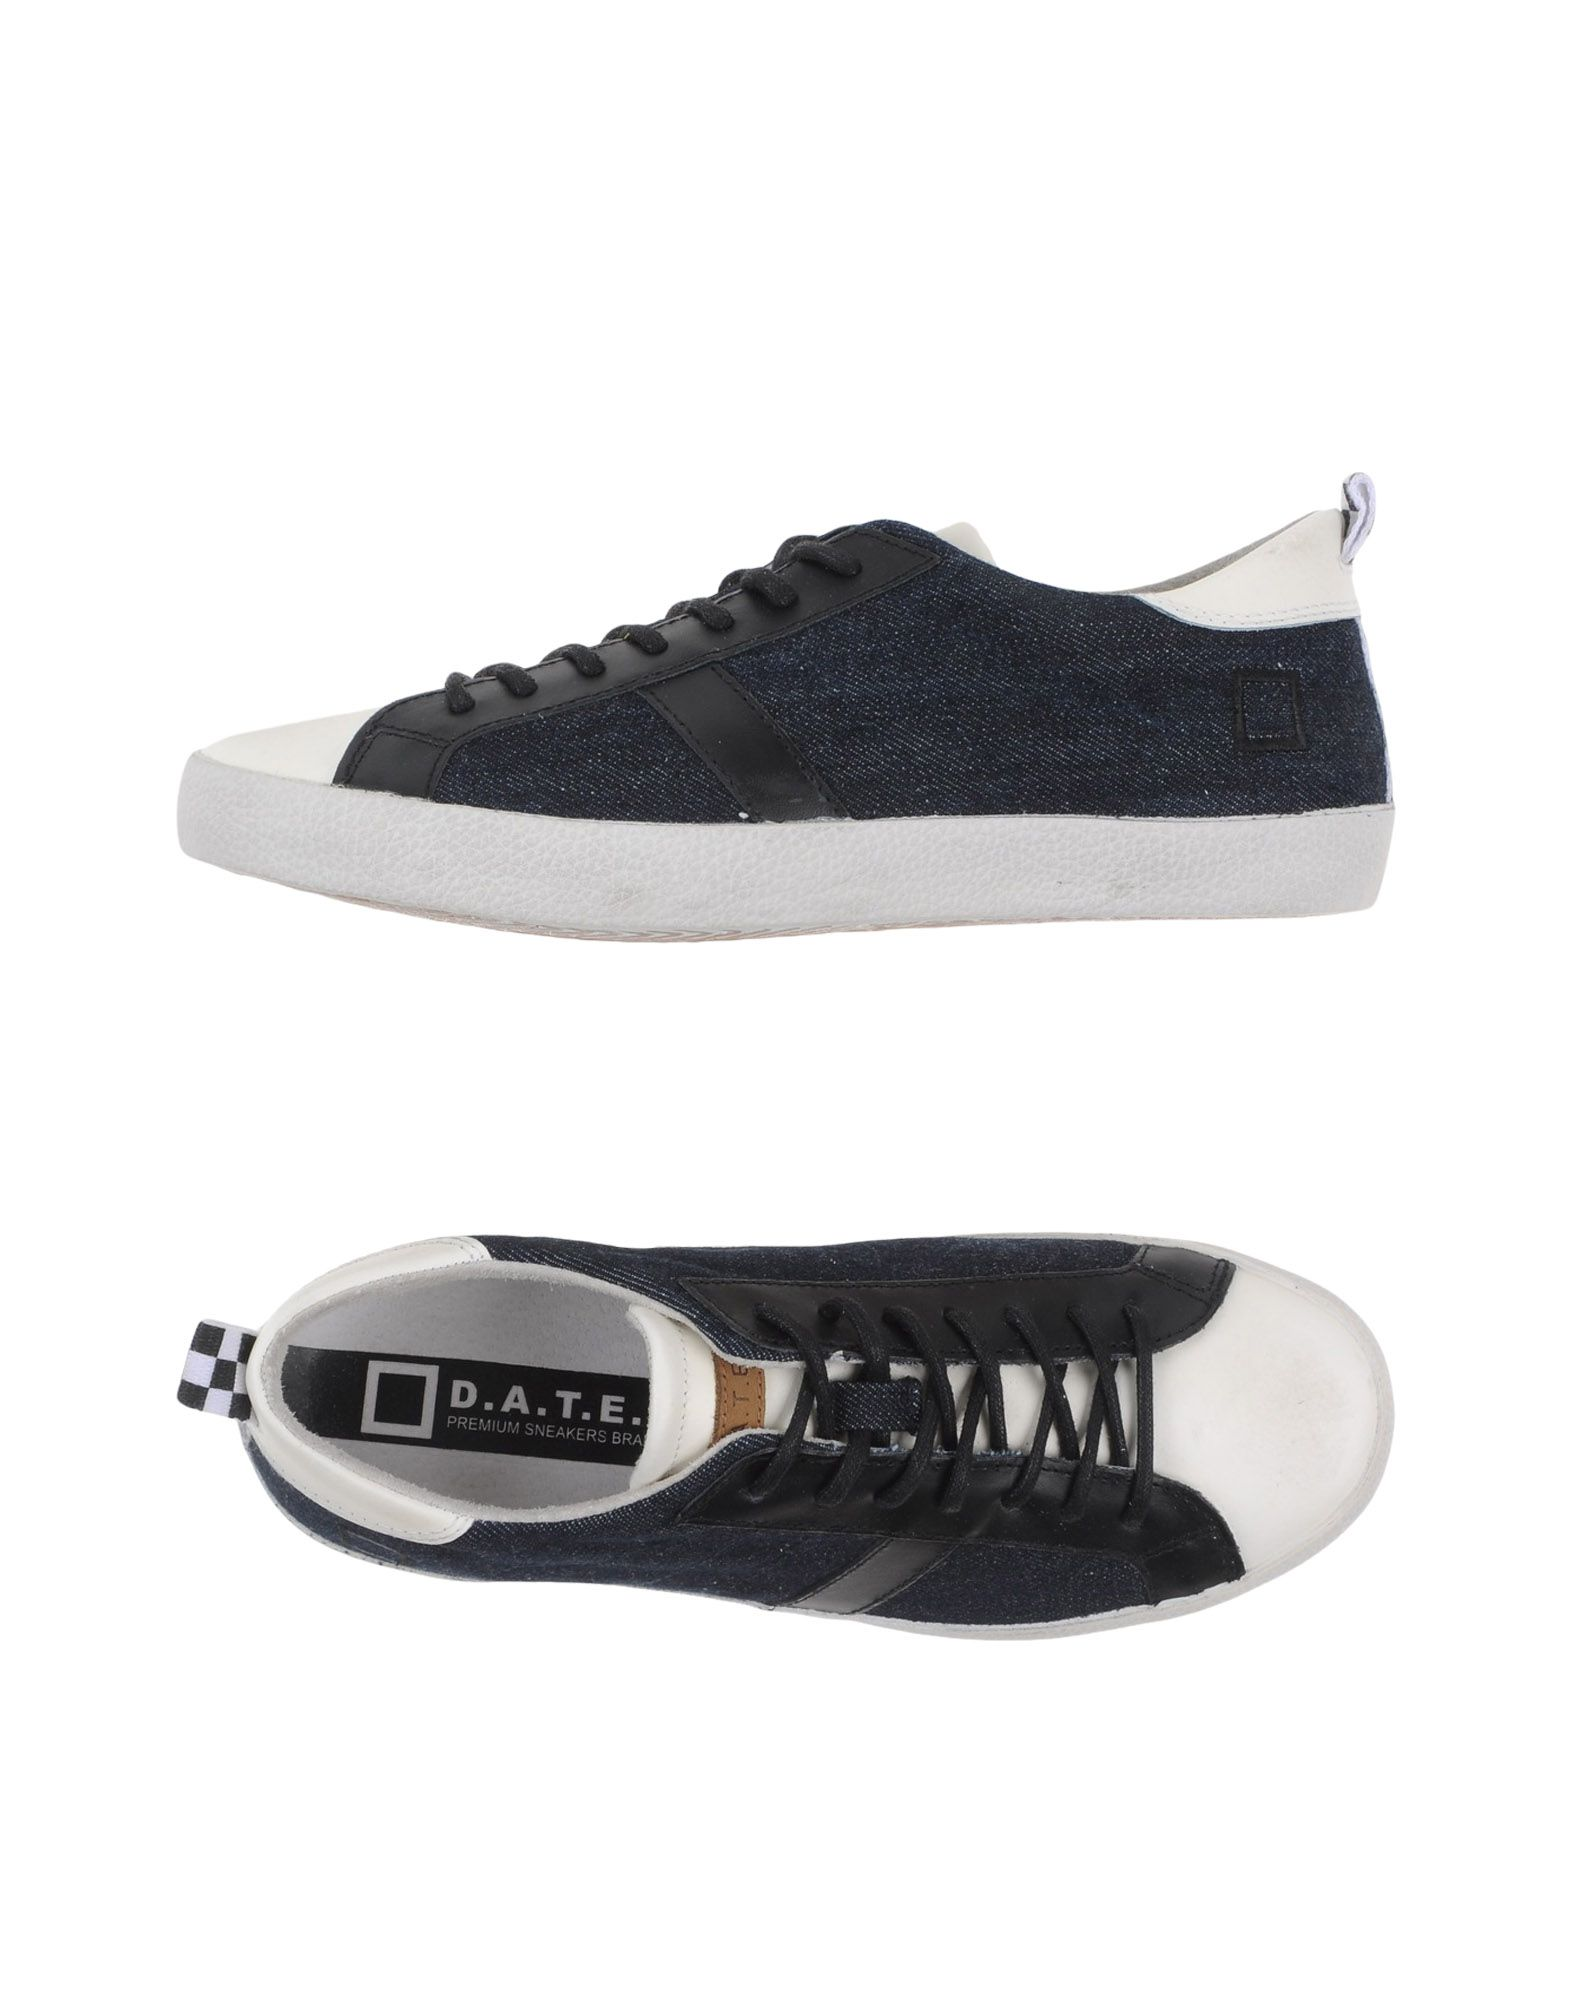 44953211MJ D.A.T.E. Sneakers Herren  44953211MJ  Heiße Schuhe 415ff4